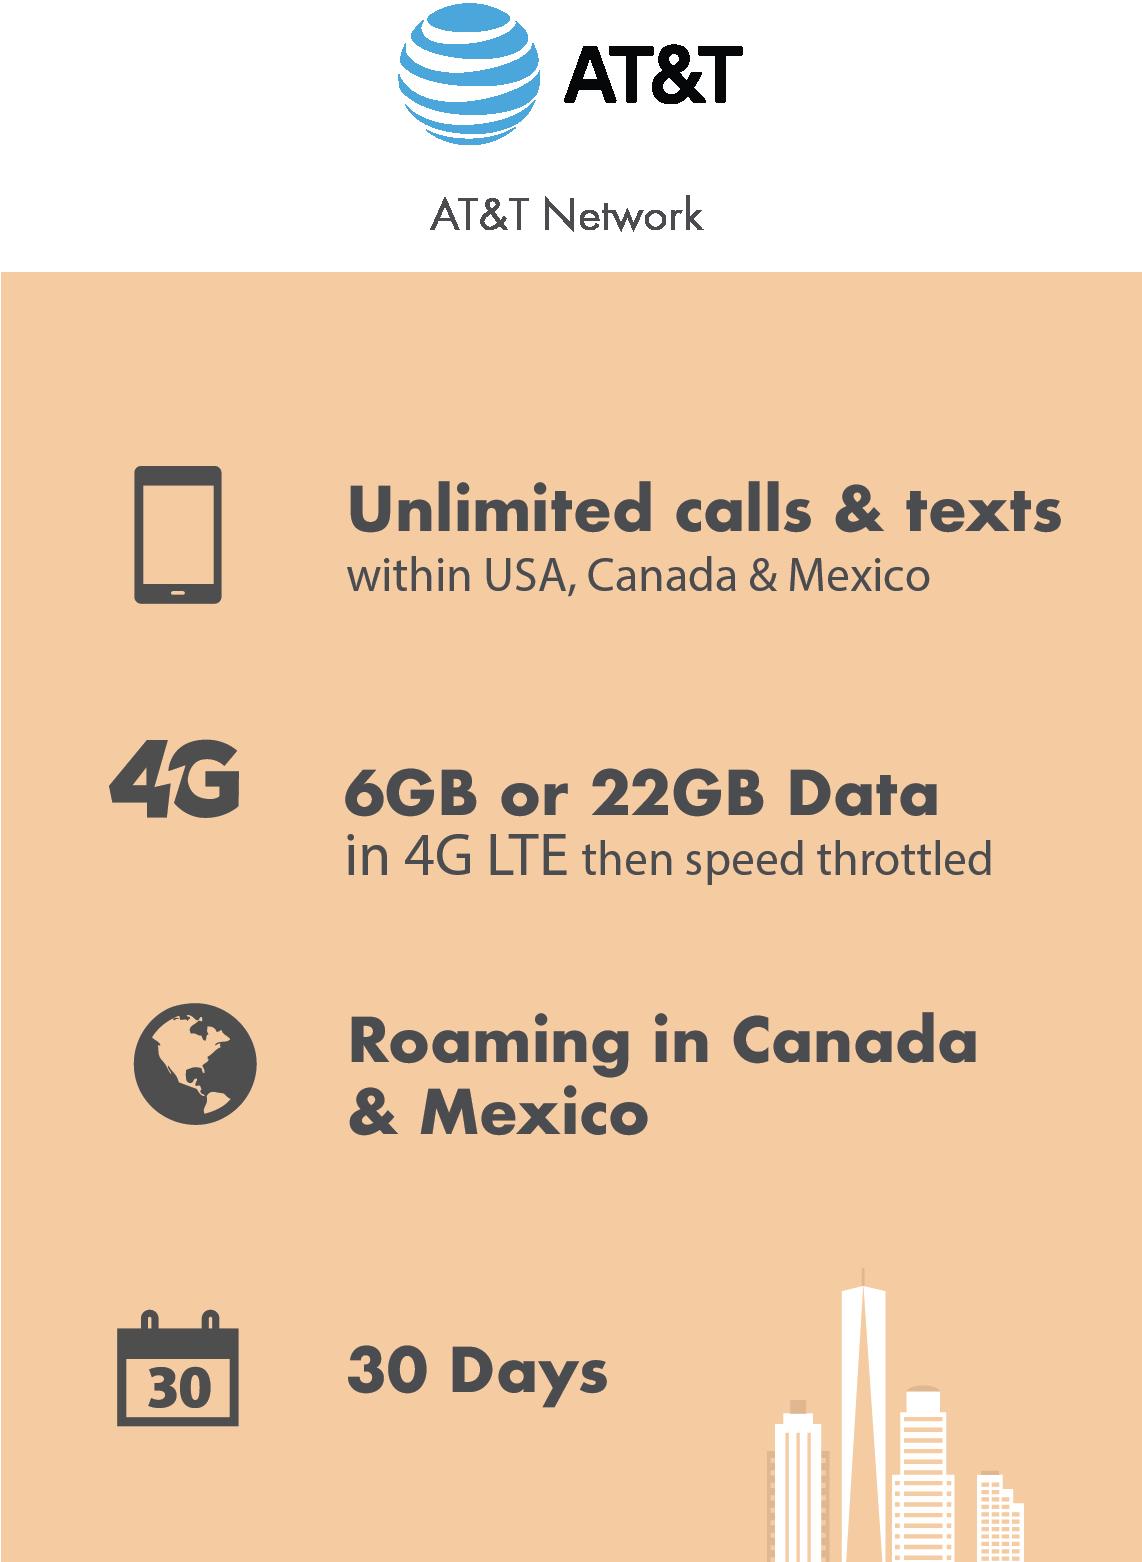 AT&T 6GB or 22GB